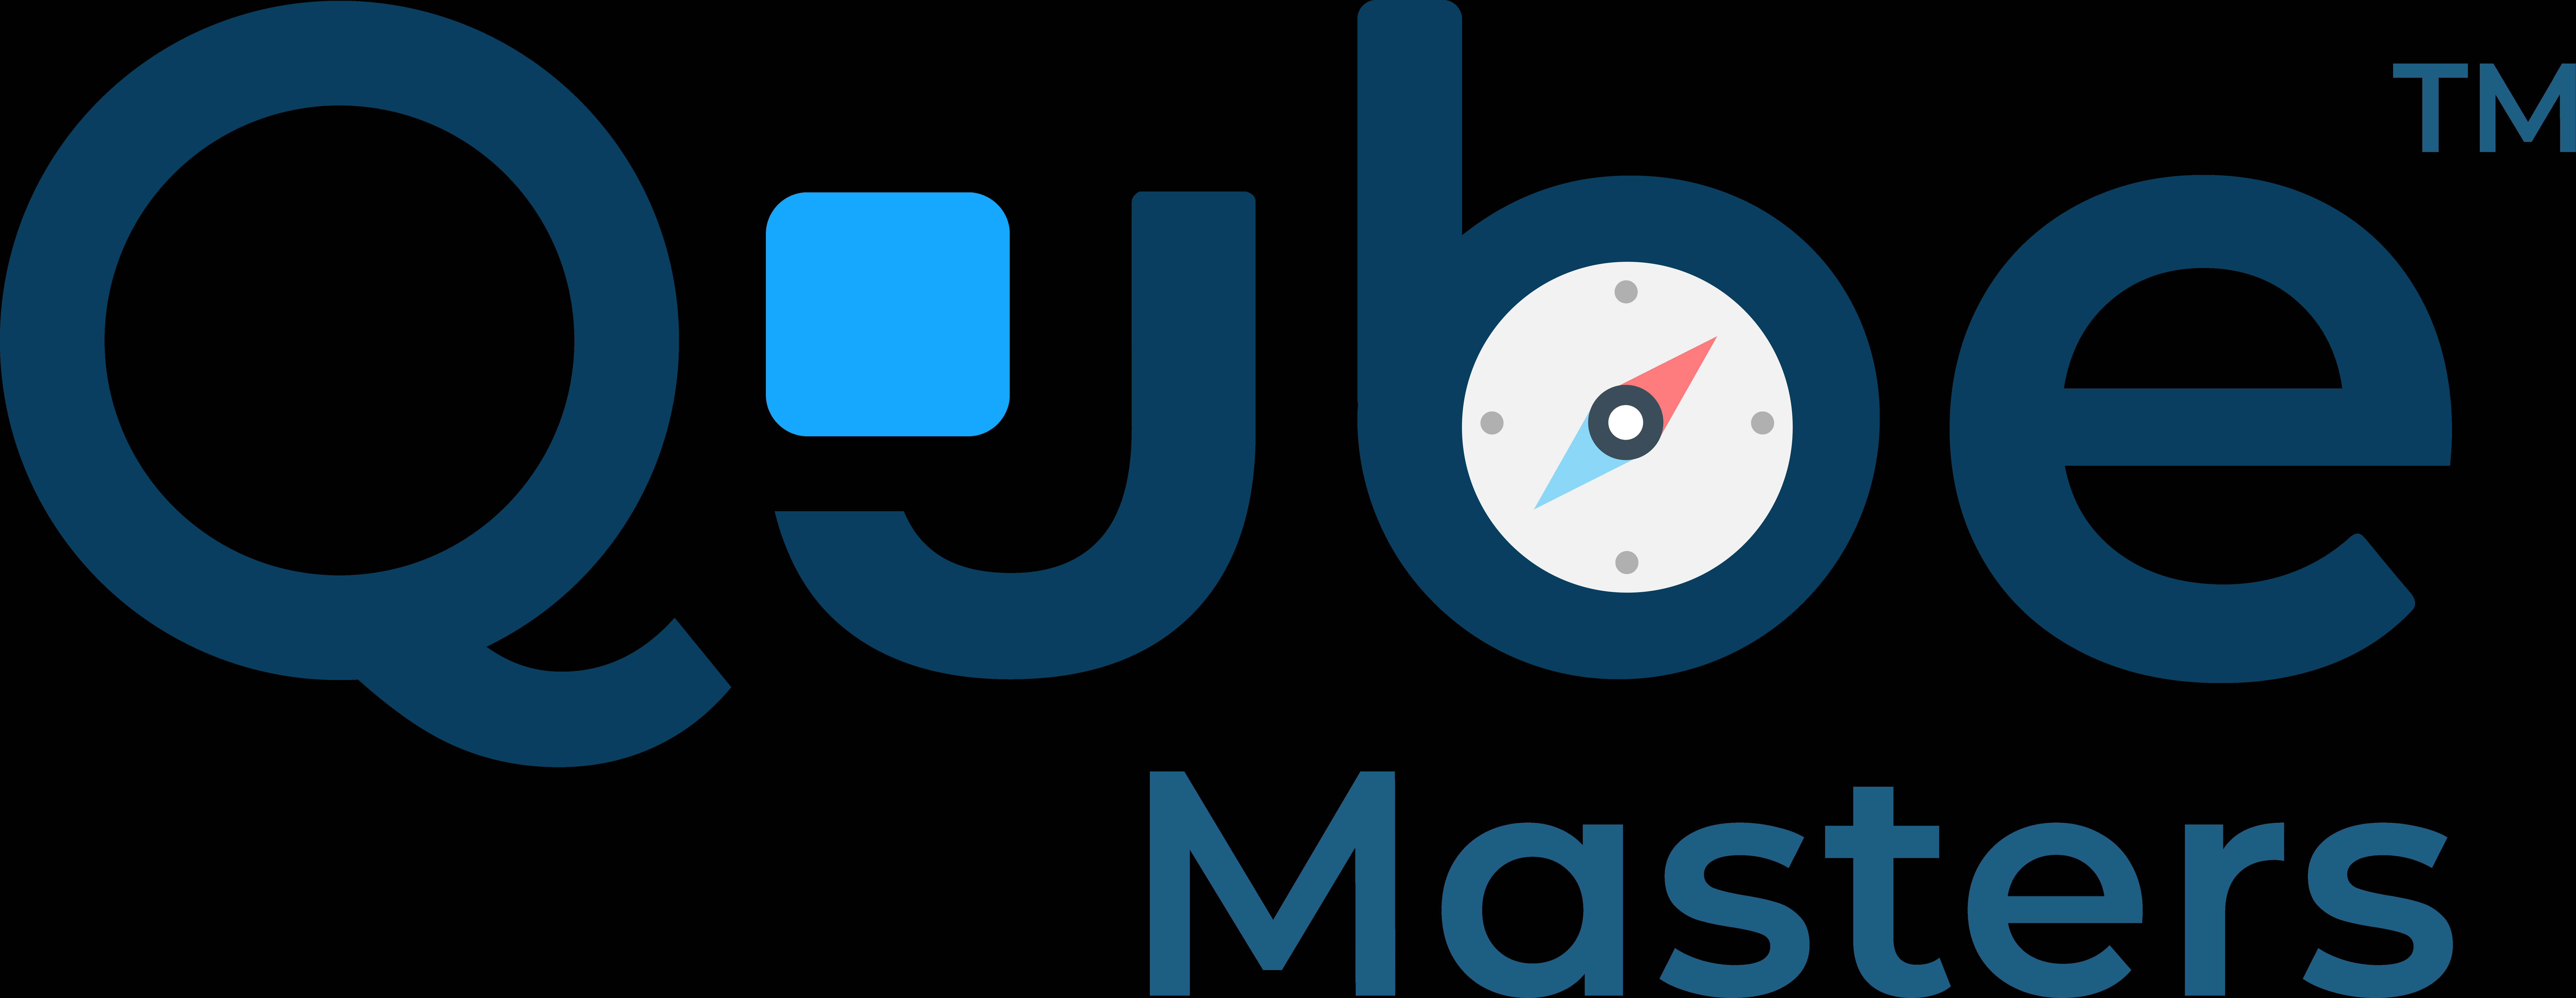 Qube Masters Logo